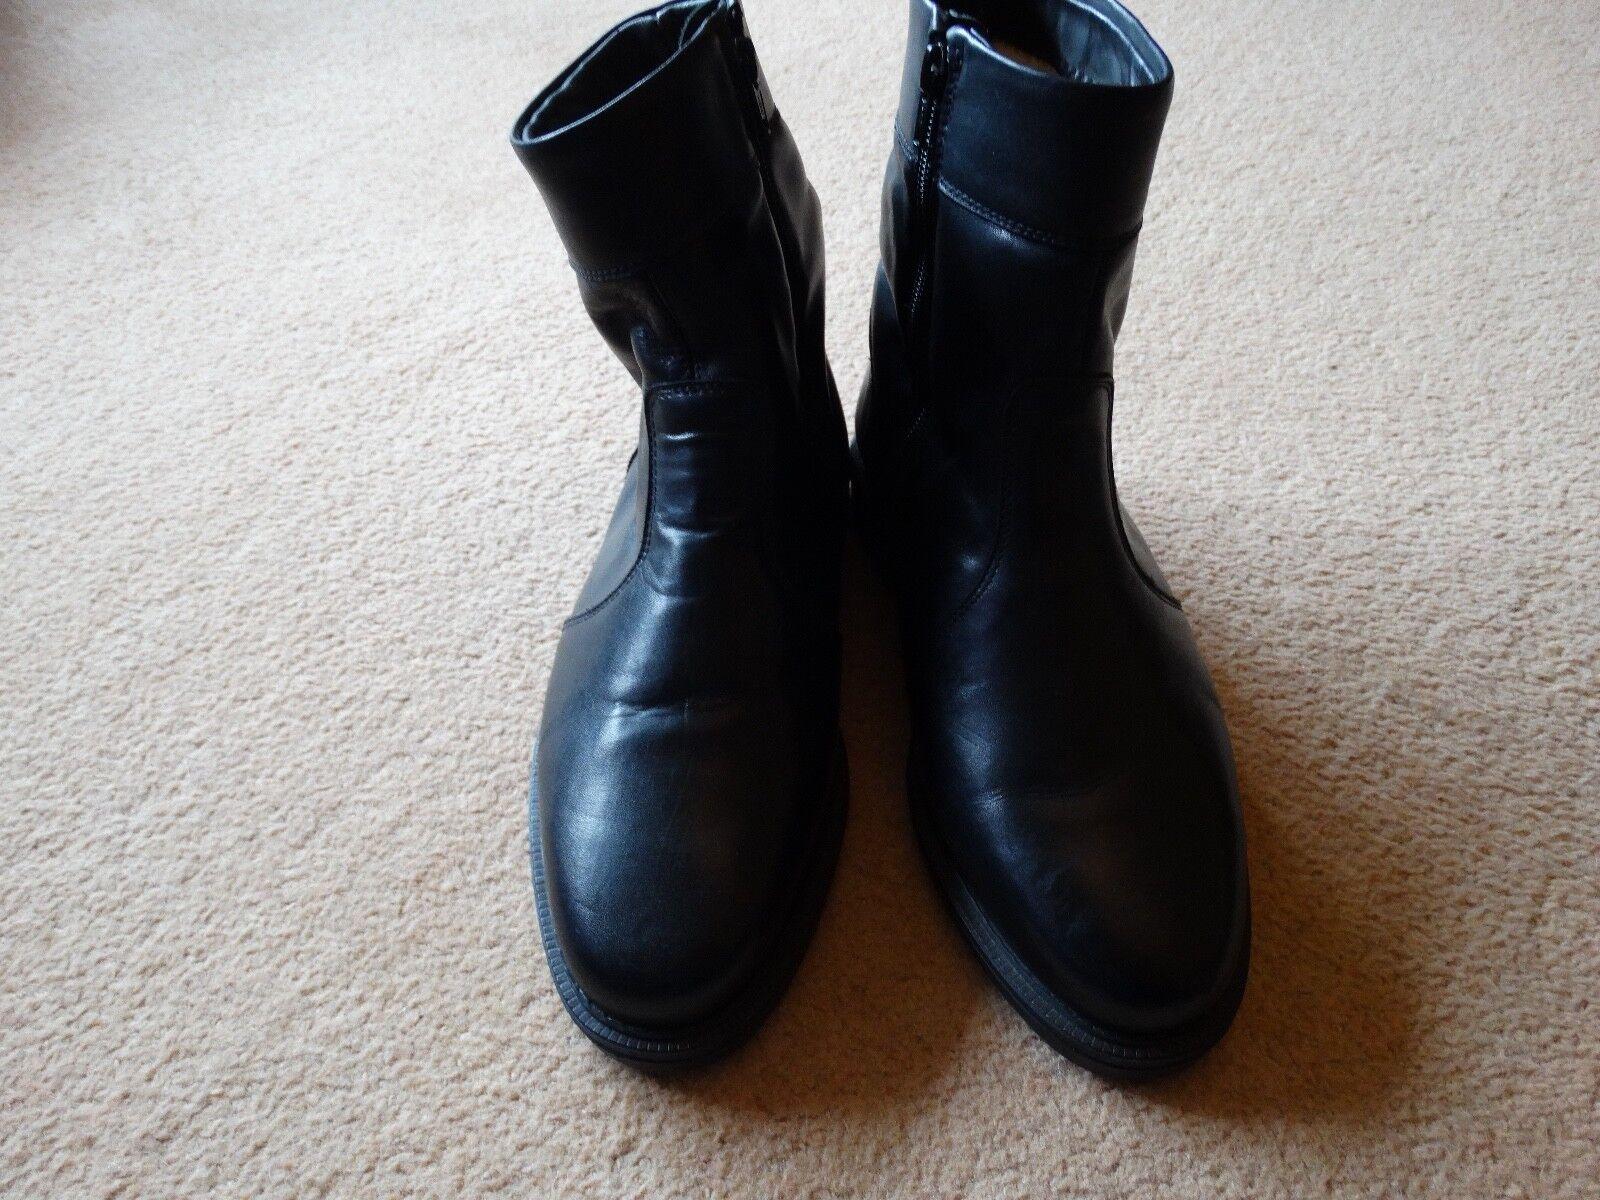 MEN'S BLACK LEATHER SIDE ZIP SHEEPSKIN WOOL LINED BOOTS UK 8 NEVER WORN NEW